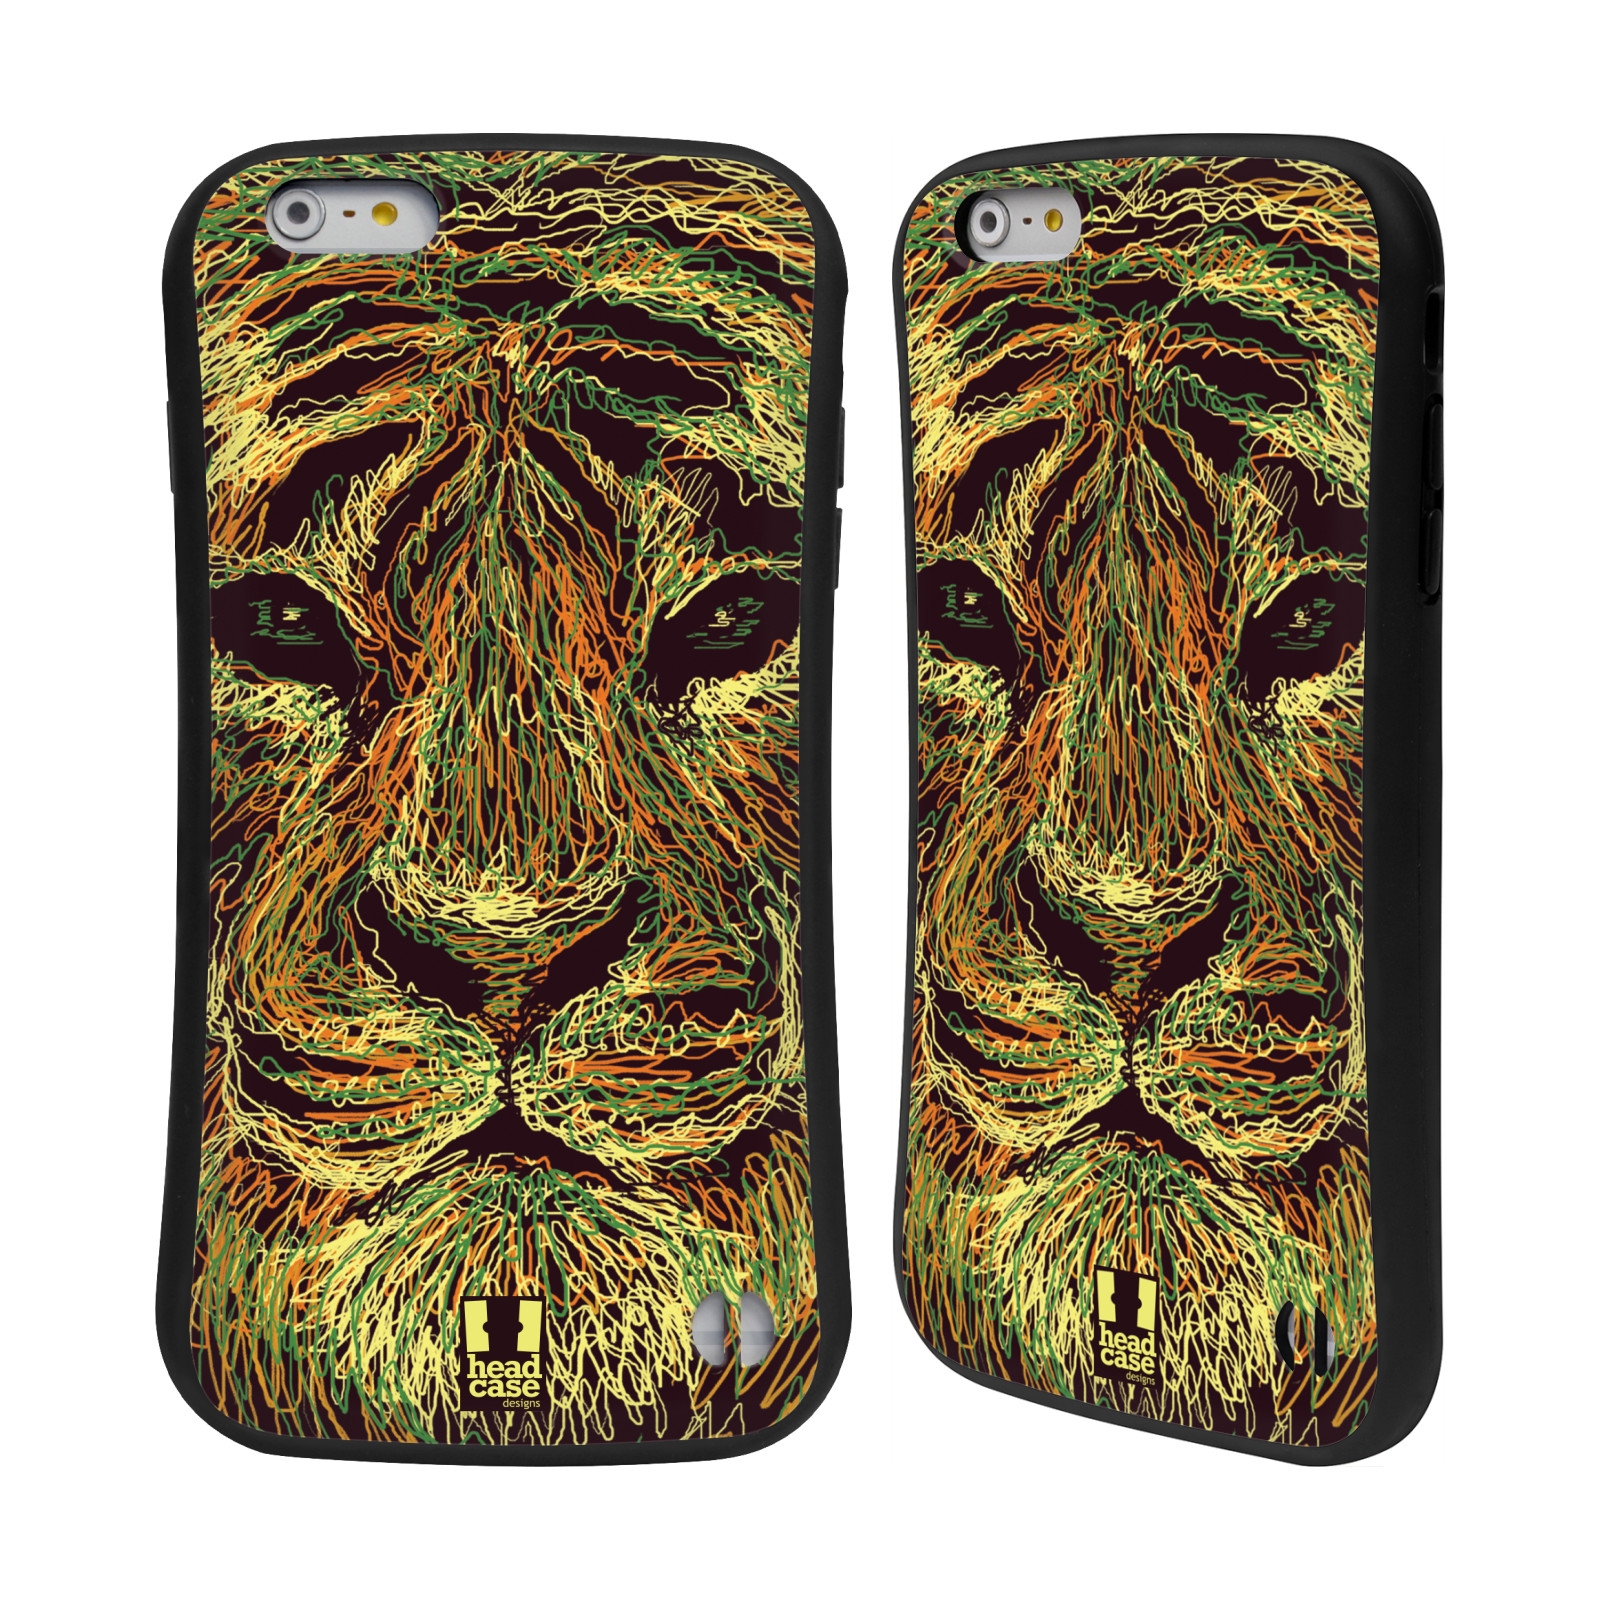 HEAD CASE silikon/plast odolný obal na mobil Apple Iphone 6 PLUS / 6S PLUS vzor zvíře čmáranice tygr